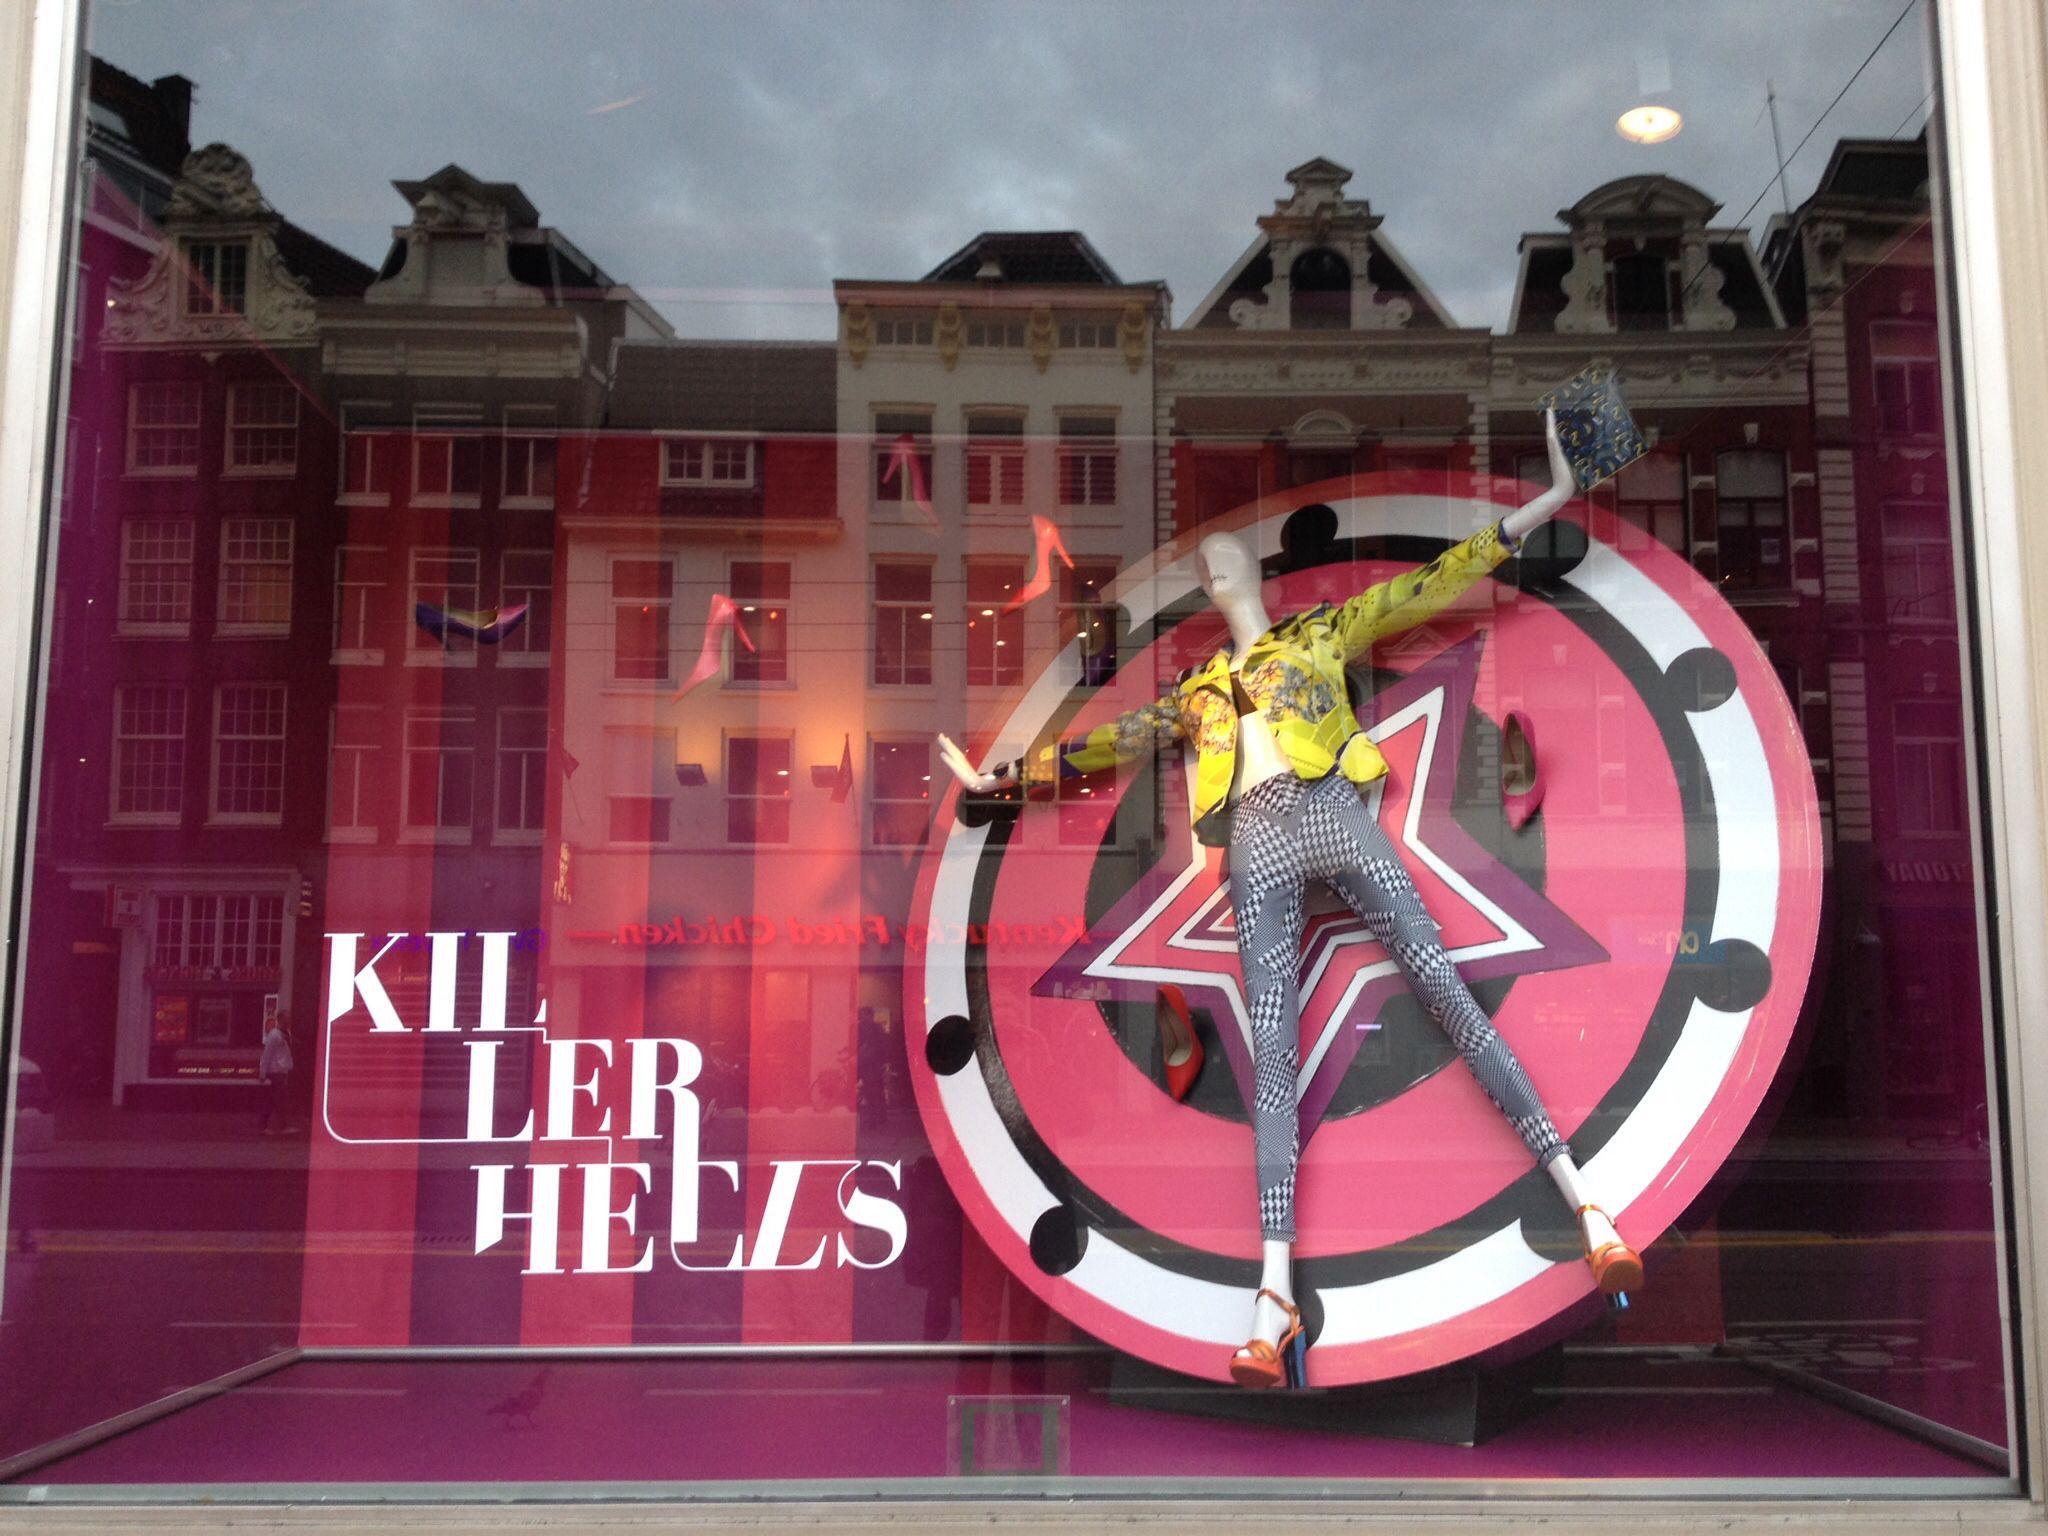 Amsterdam de Bijenkorf Fearless campaign april 2014